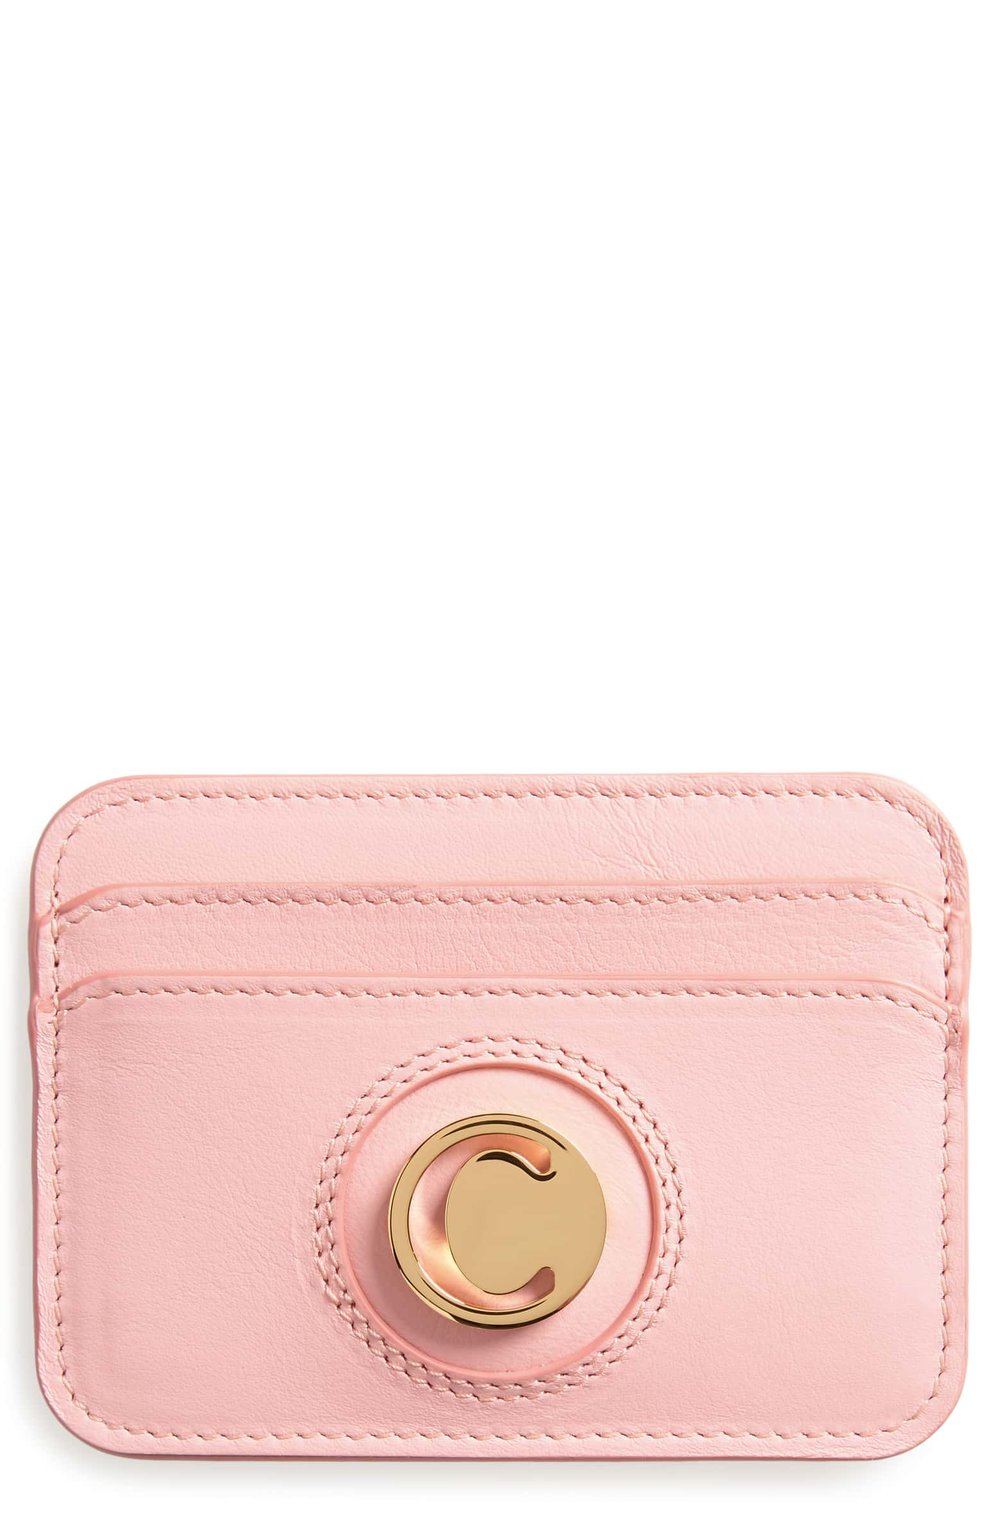 chloe leather card holder.jpg